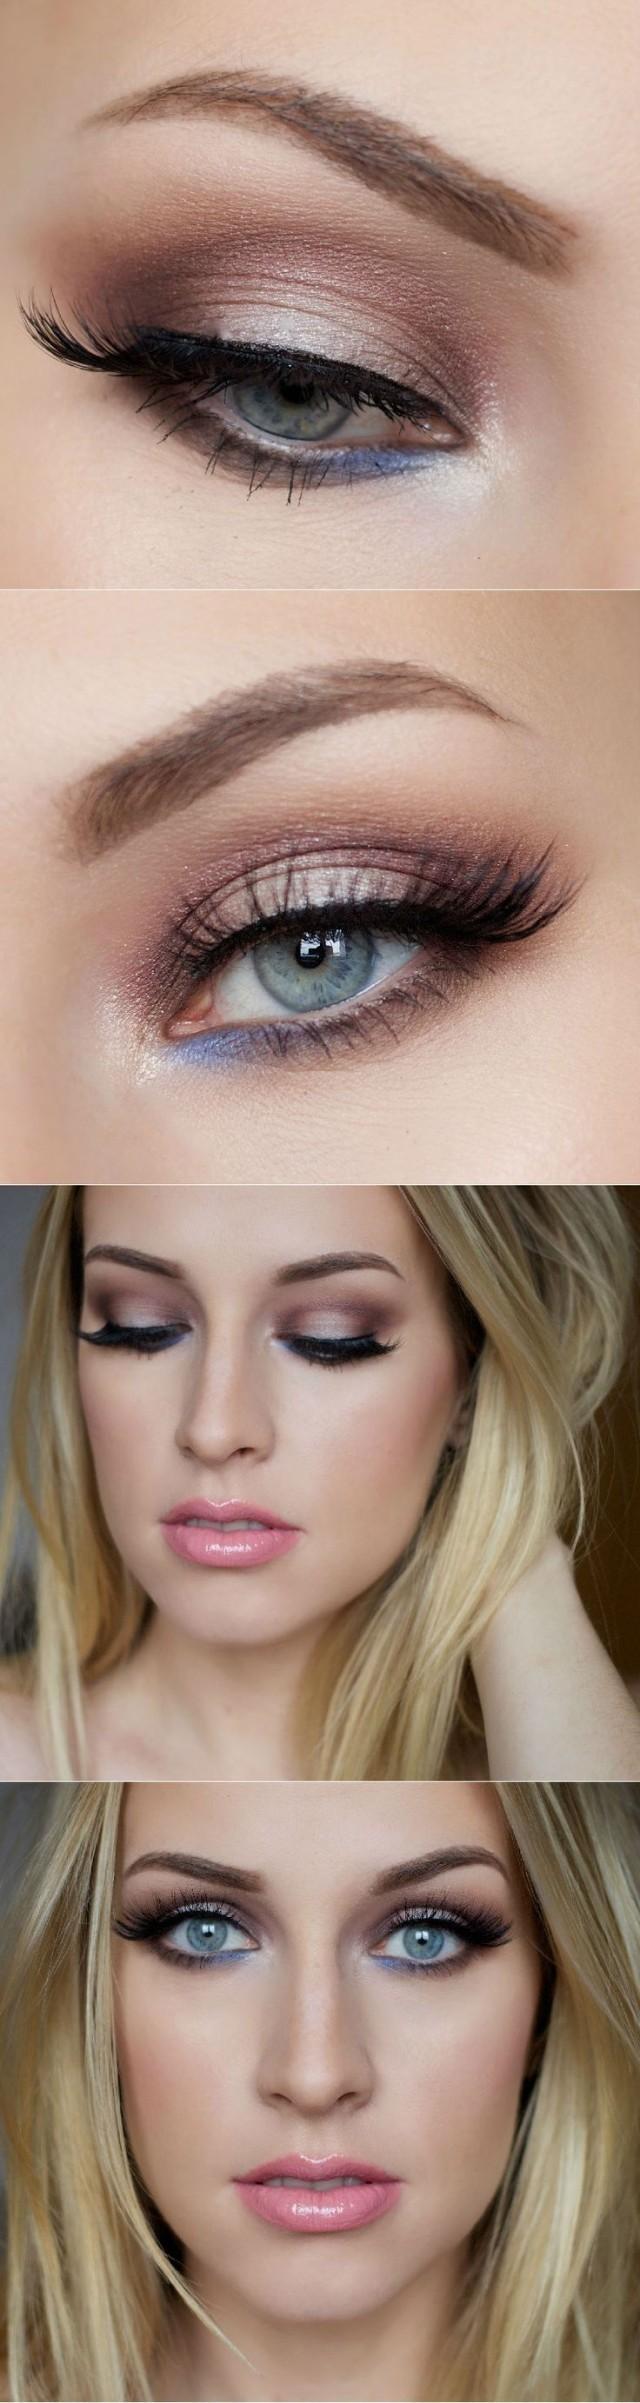 Makeup For Fair Skin And Blue Eyes   Makeupsites.co in Makeup Tips Blue Eyes Fair Skin